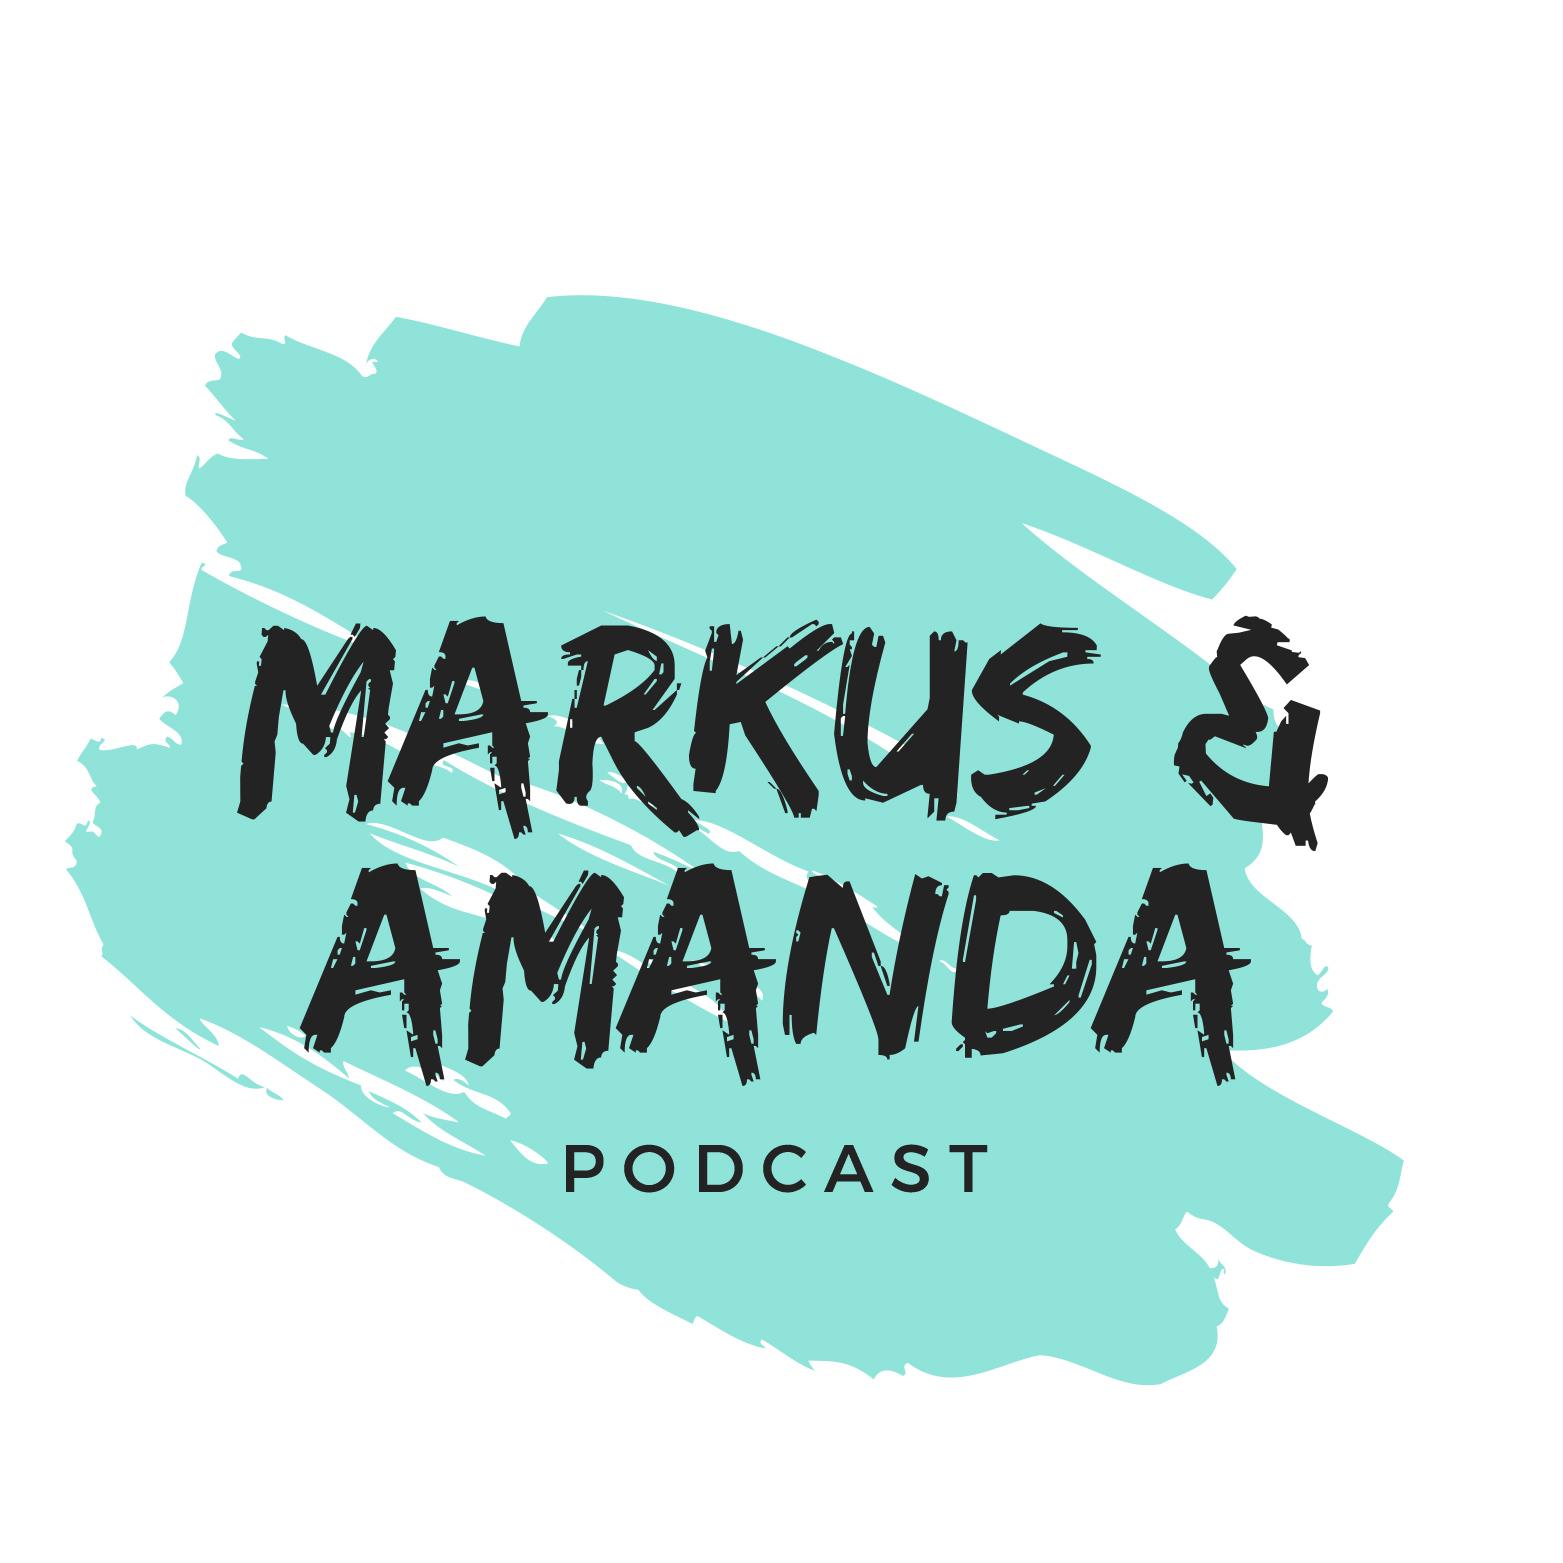 Markus & Amanda Podcast show art